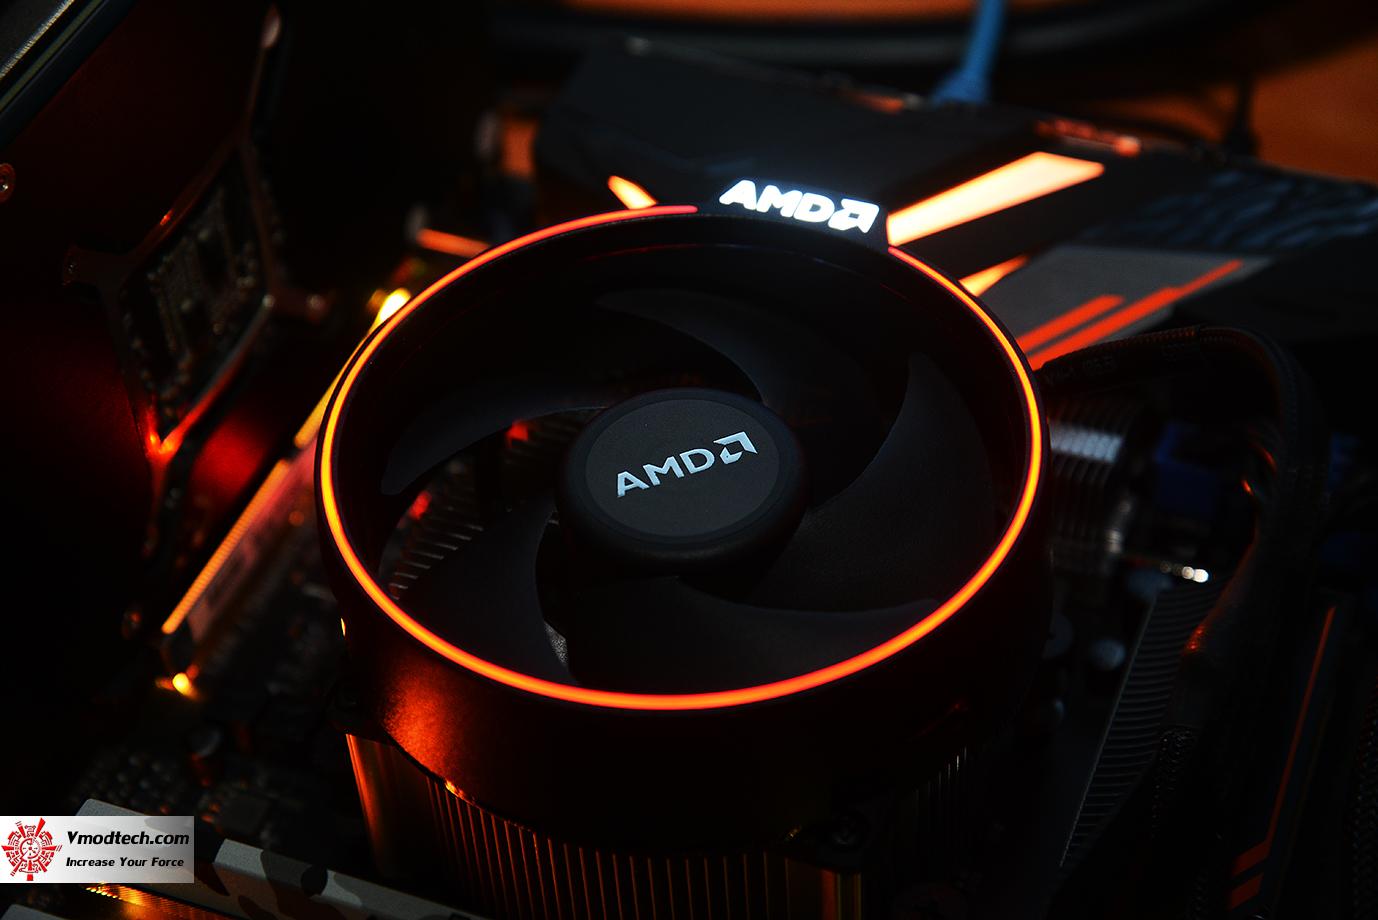 dsc 24531 AMD RYZEN 7 2700 and StoreMI Technology Review